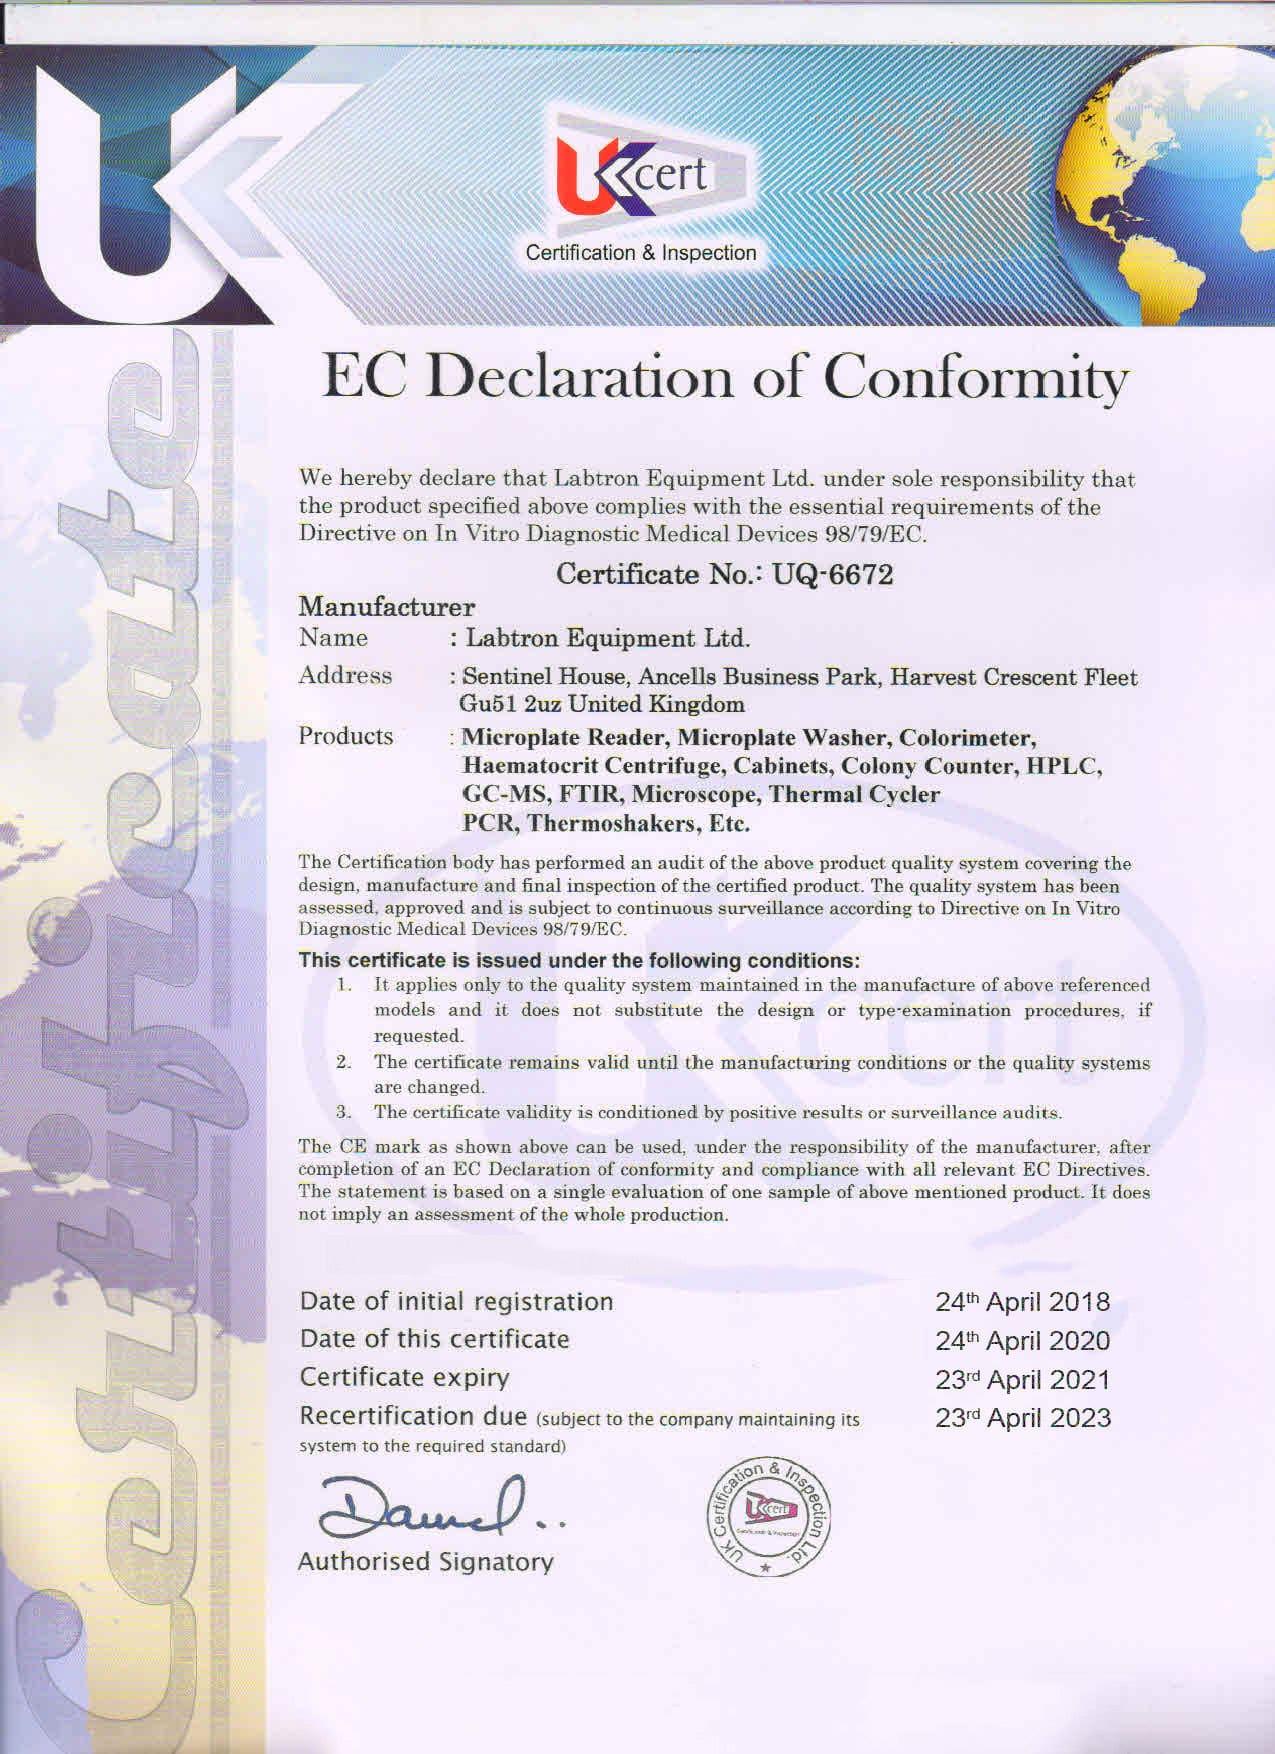 Labtron Equipment Ltd. EC Declaration of Conformity : Labtron Certification